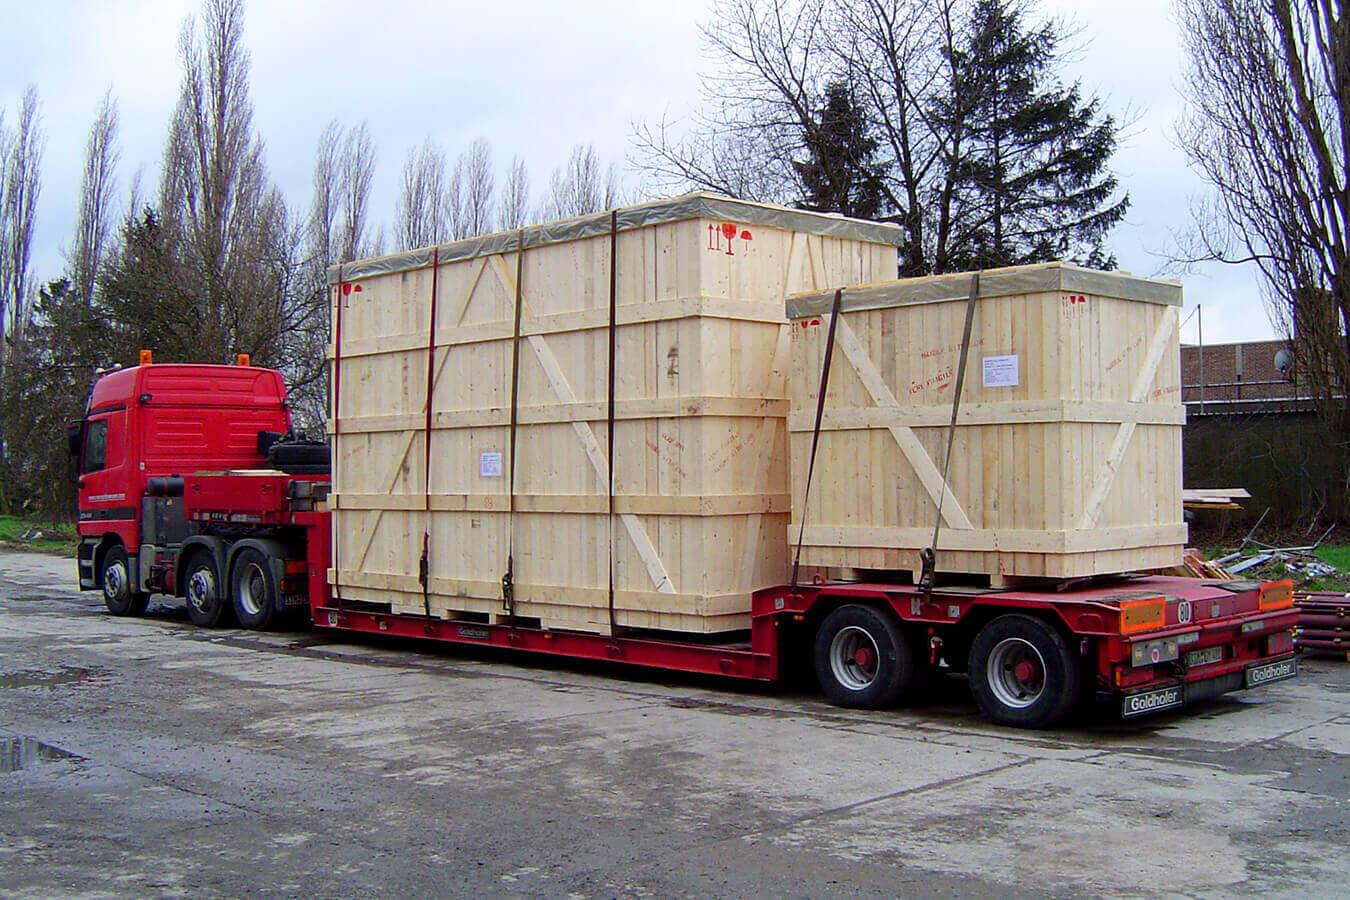 WaluPack Services : Industriële verpakking